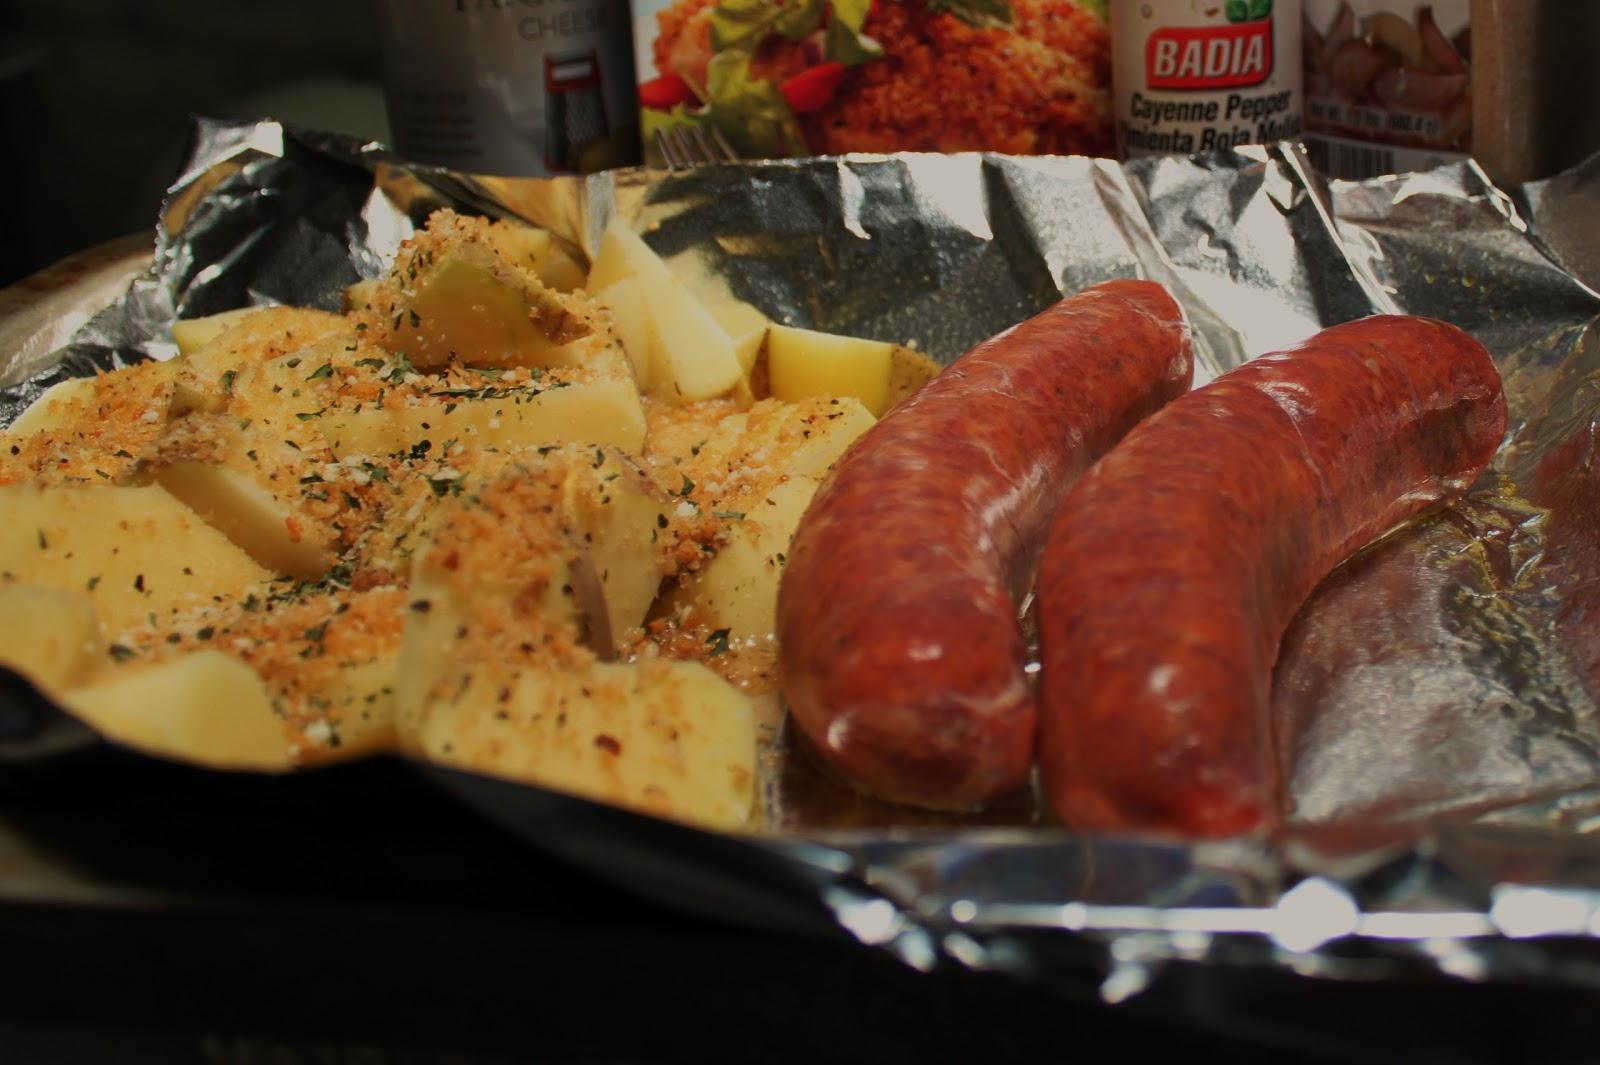 ... Cookin' Italian Style Cuisine: Homemade Italian Sausage Mom's Recipe